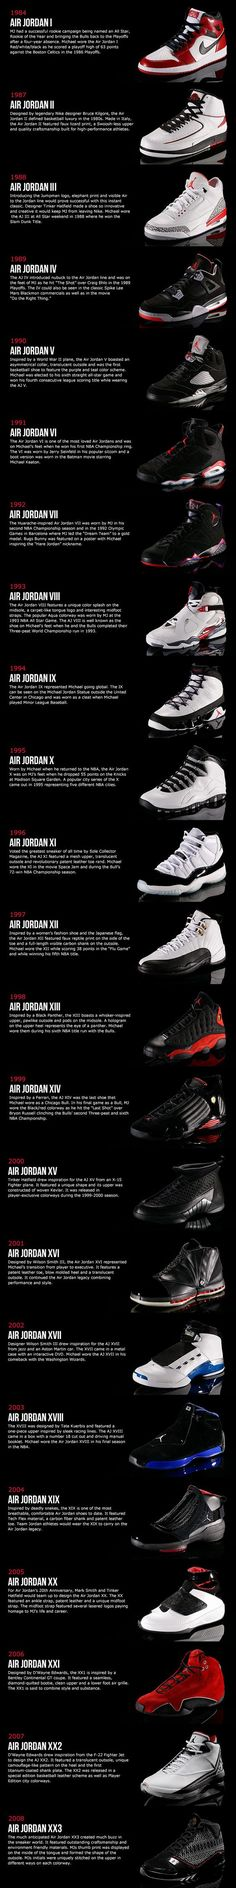 Air Jordan Basketball Shoes Ultimate Collection #amazonaffiliatelink Air Jordan Basketball Shoes, Basketball Sneakers, Air Jordan Shoes, Nike Basketball, All Jordans, Nike Air Jordans, Retro Jordans, Jordan Shoe Box Storage, Classic Nike Shoes